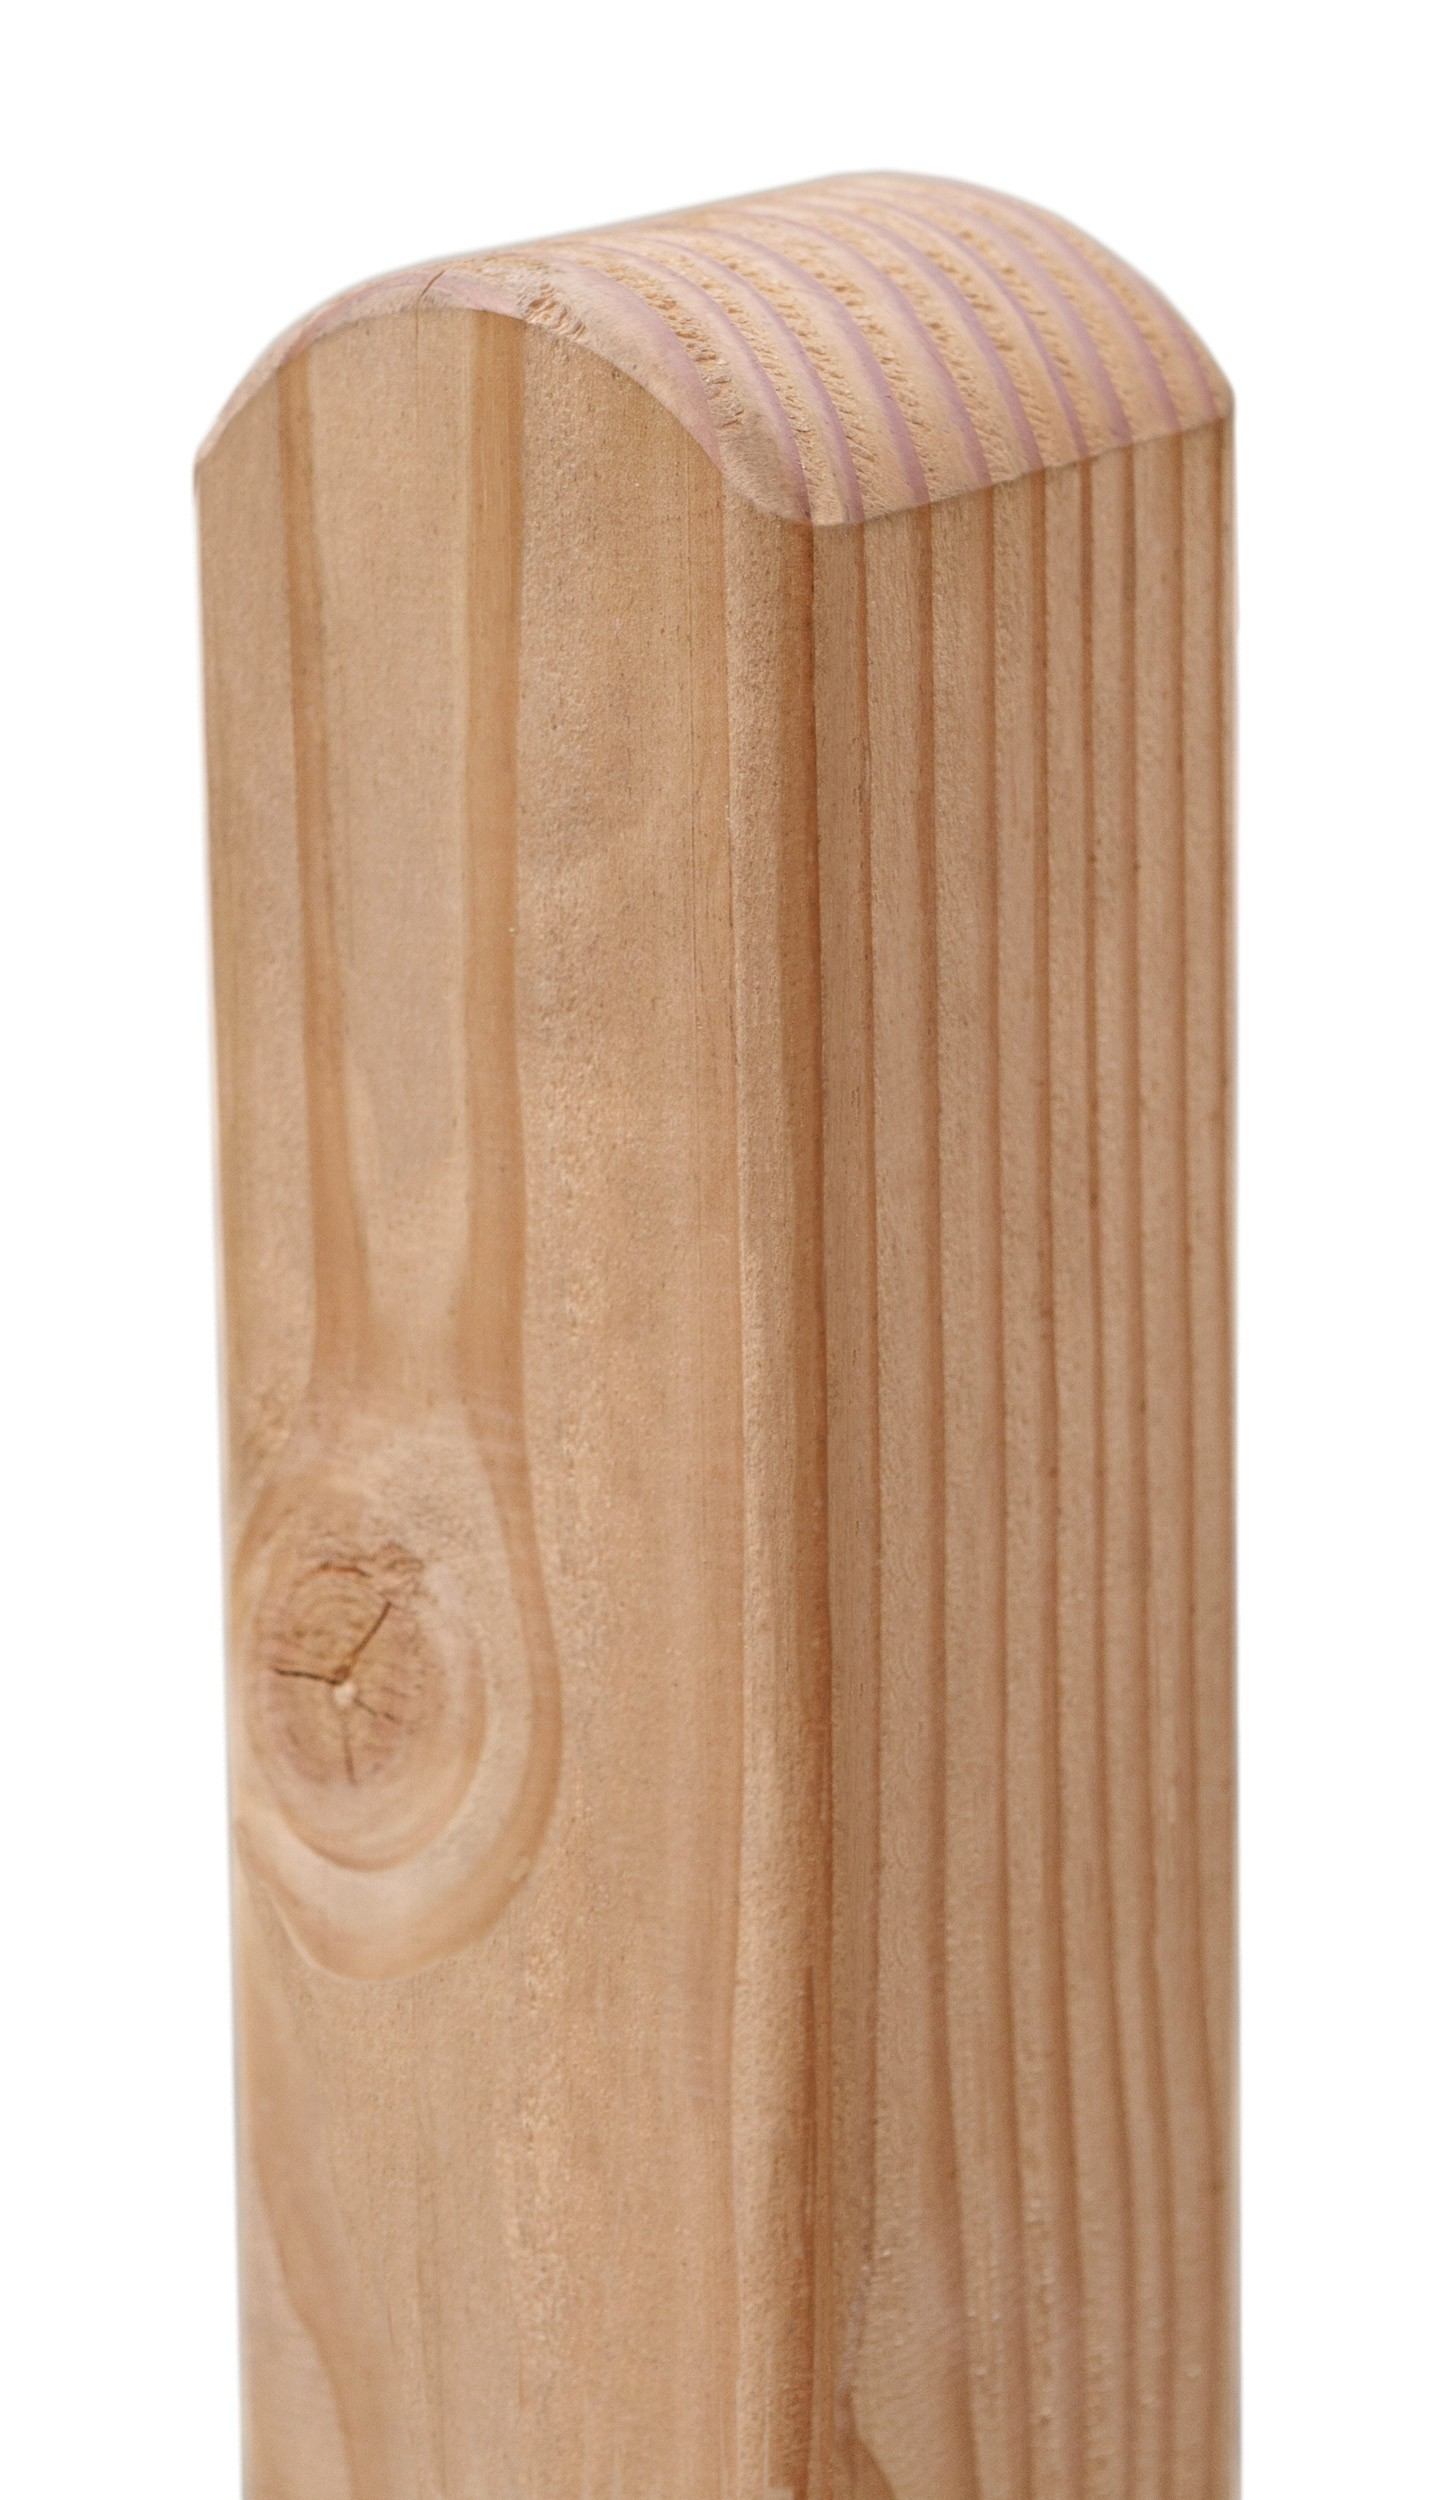 Zaunpfosten Pfosten Rundkopf Lärche natur 9x9cm L 100cm bei